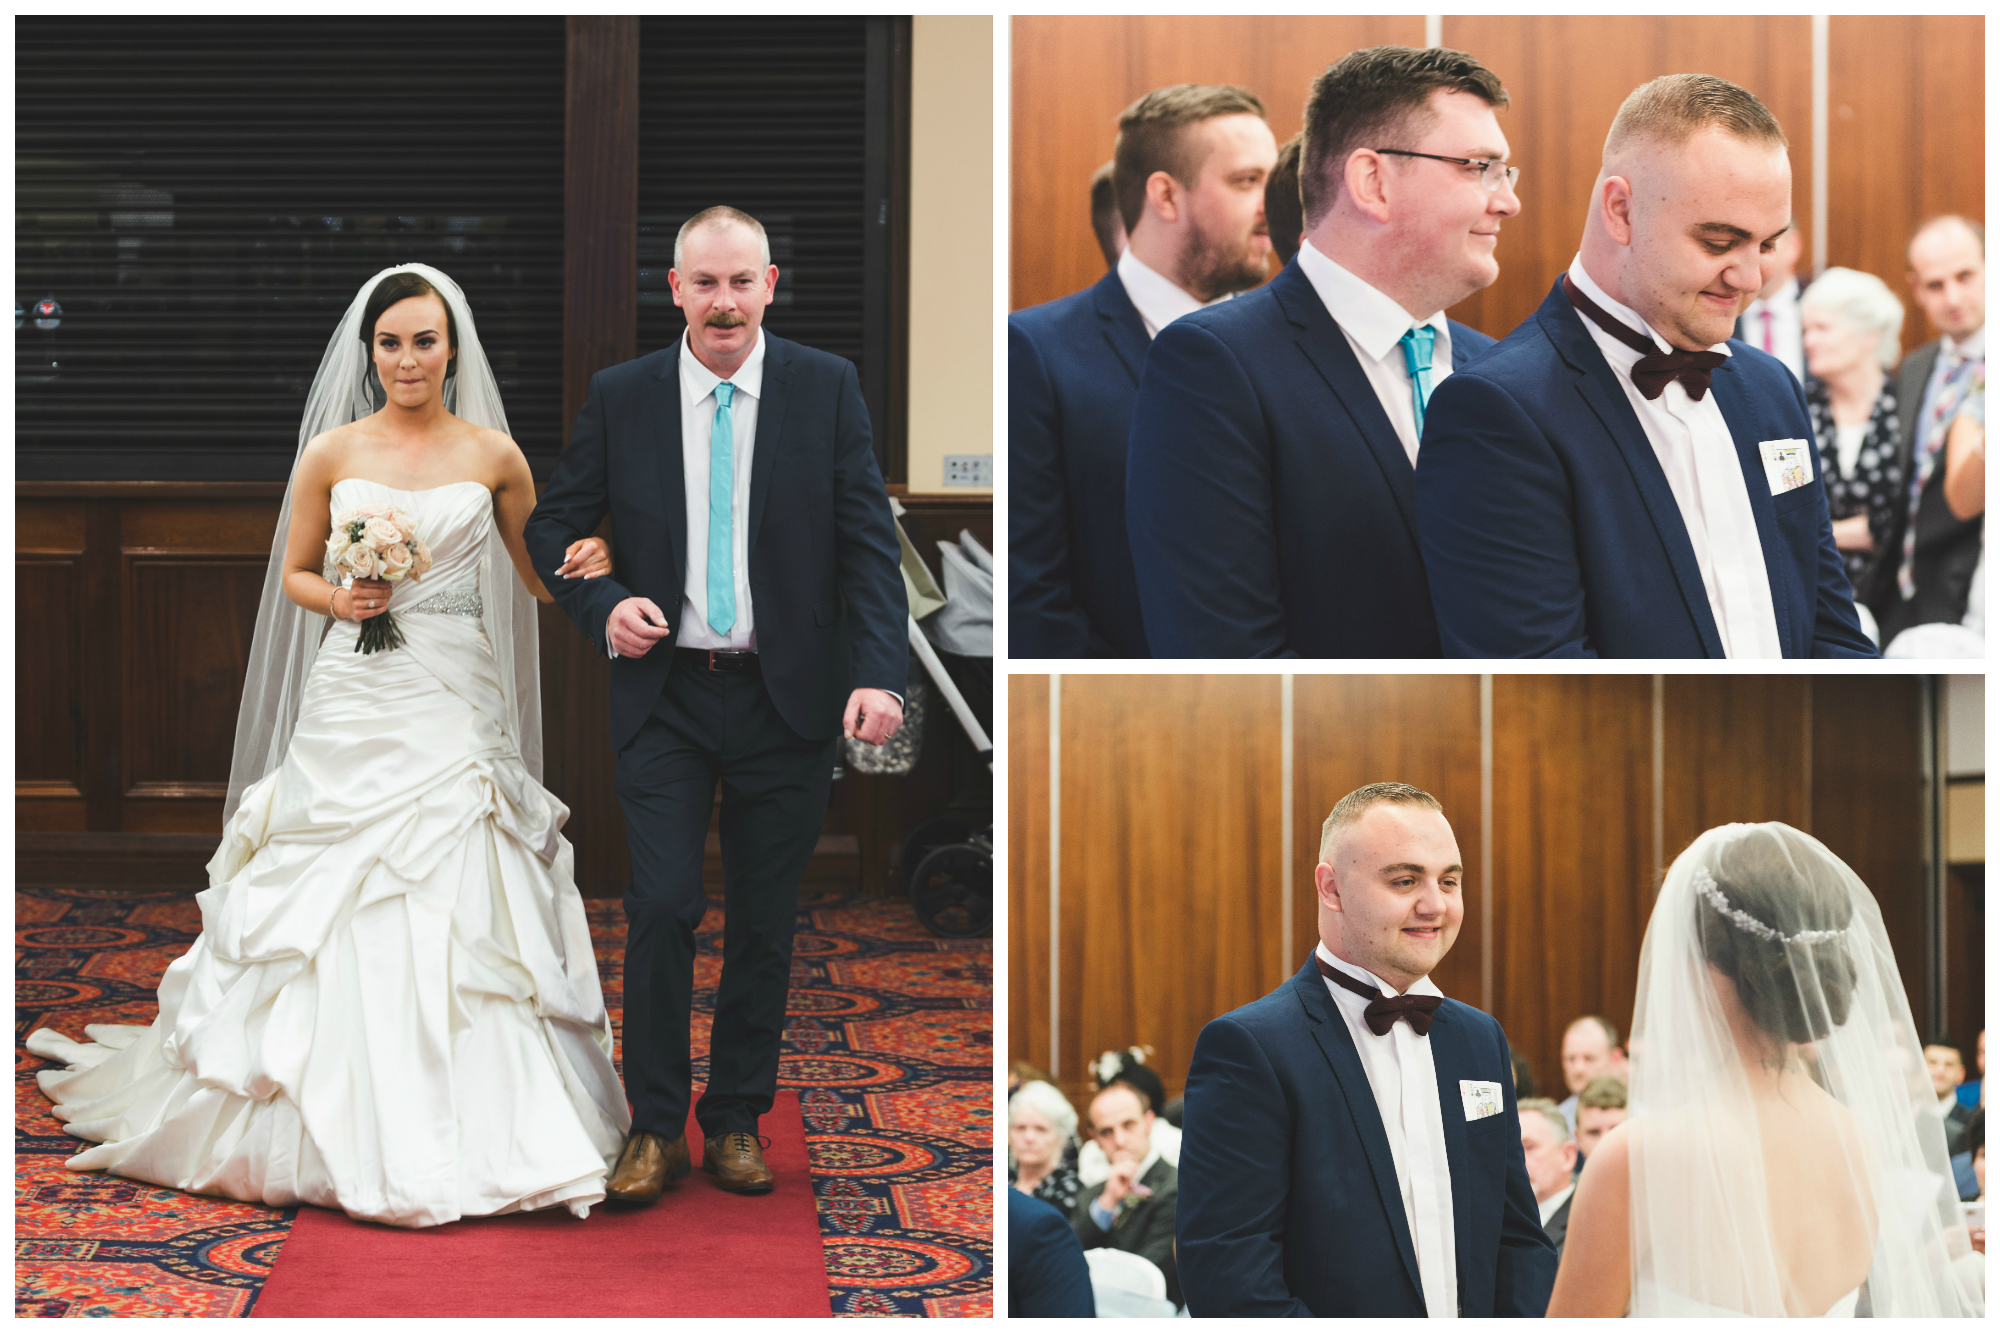 Northern_Ireland_Wedding_Photographer_Purephotoni_Dunsilly_Hotel_Wedding_Ceremony_Bride_Groom.jpg